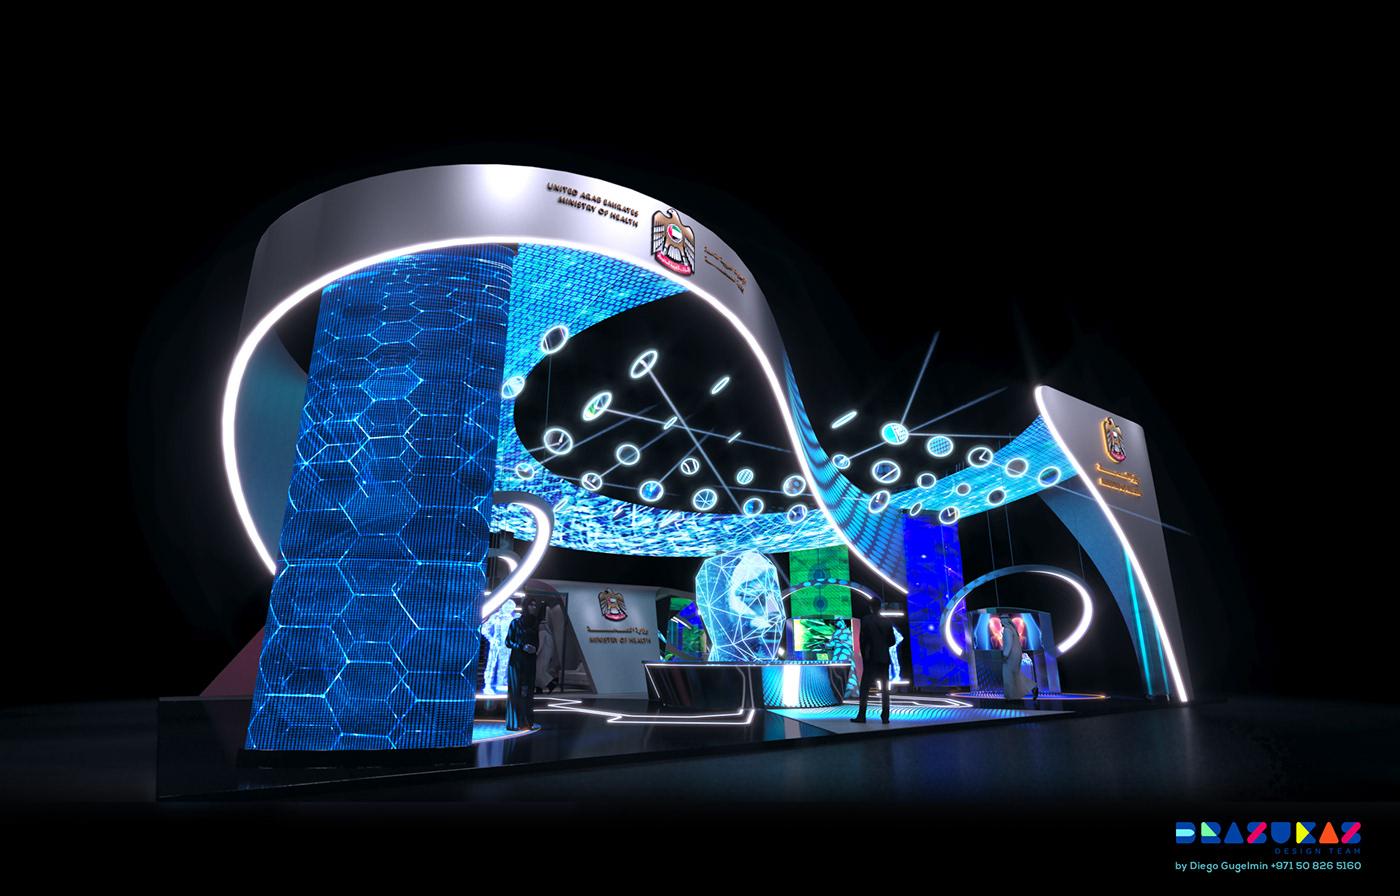 Arabhealth brazukaz design diegogugelmin dubai Event Exhibition  exhibitiondesign MarceloPaoli Technology